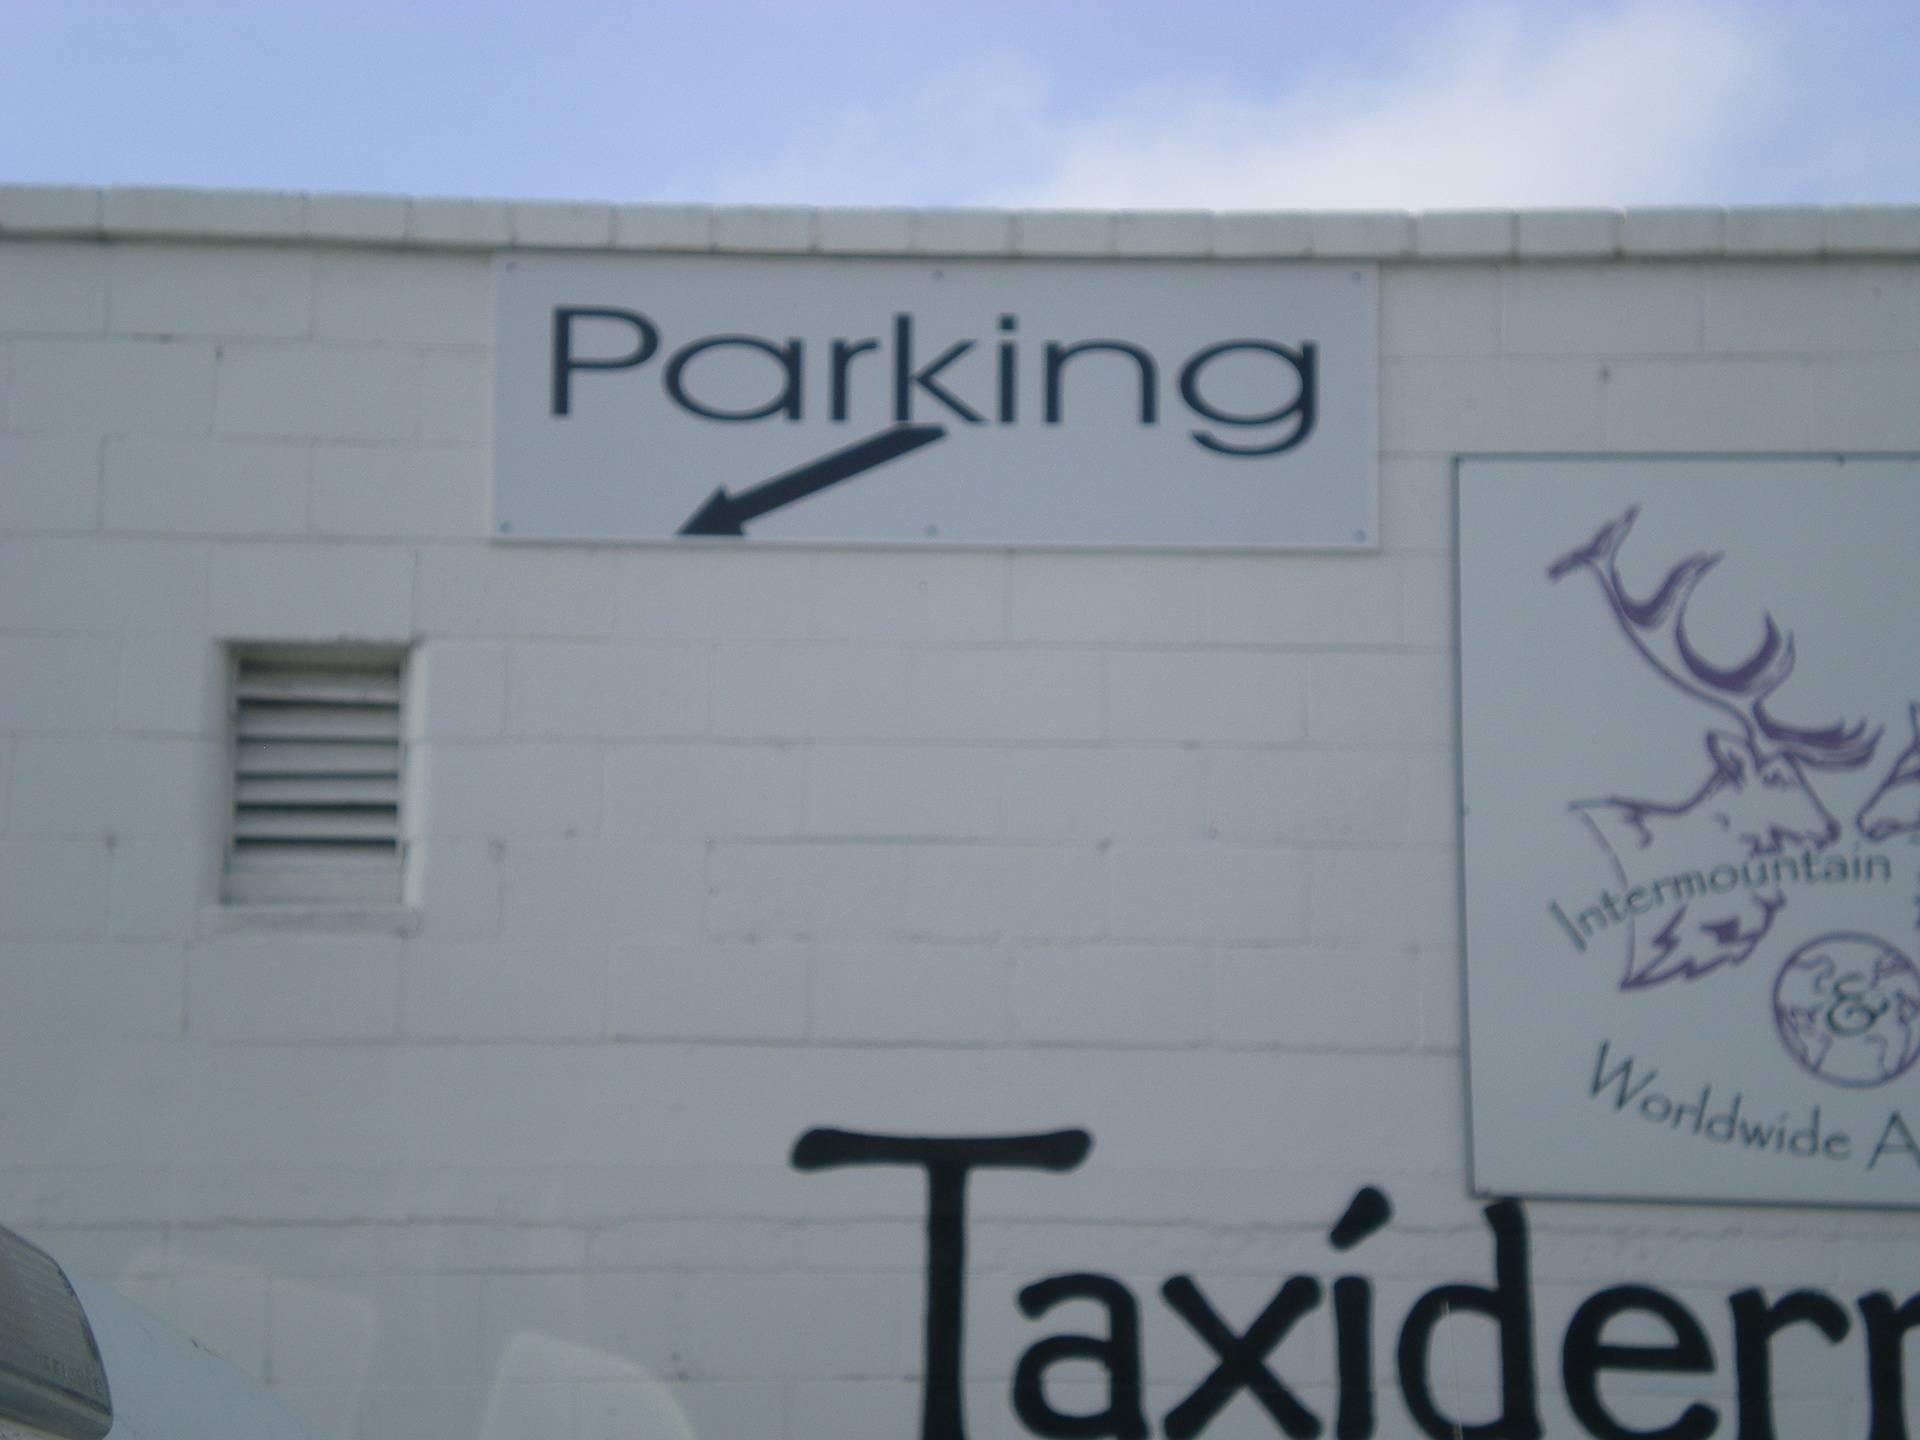 Parking Direction Sign